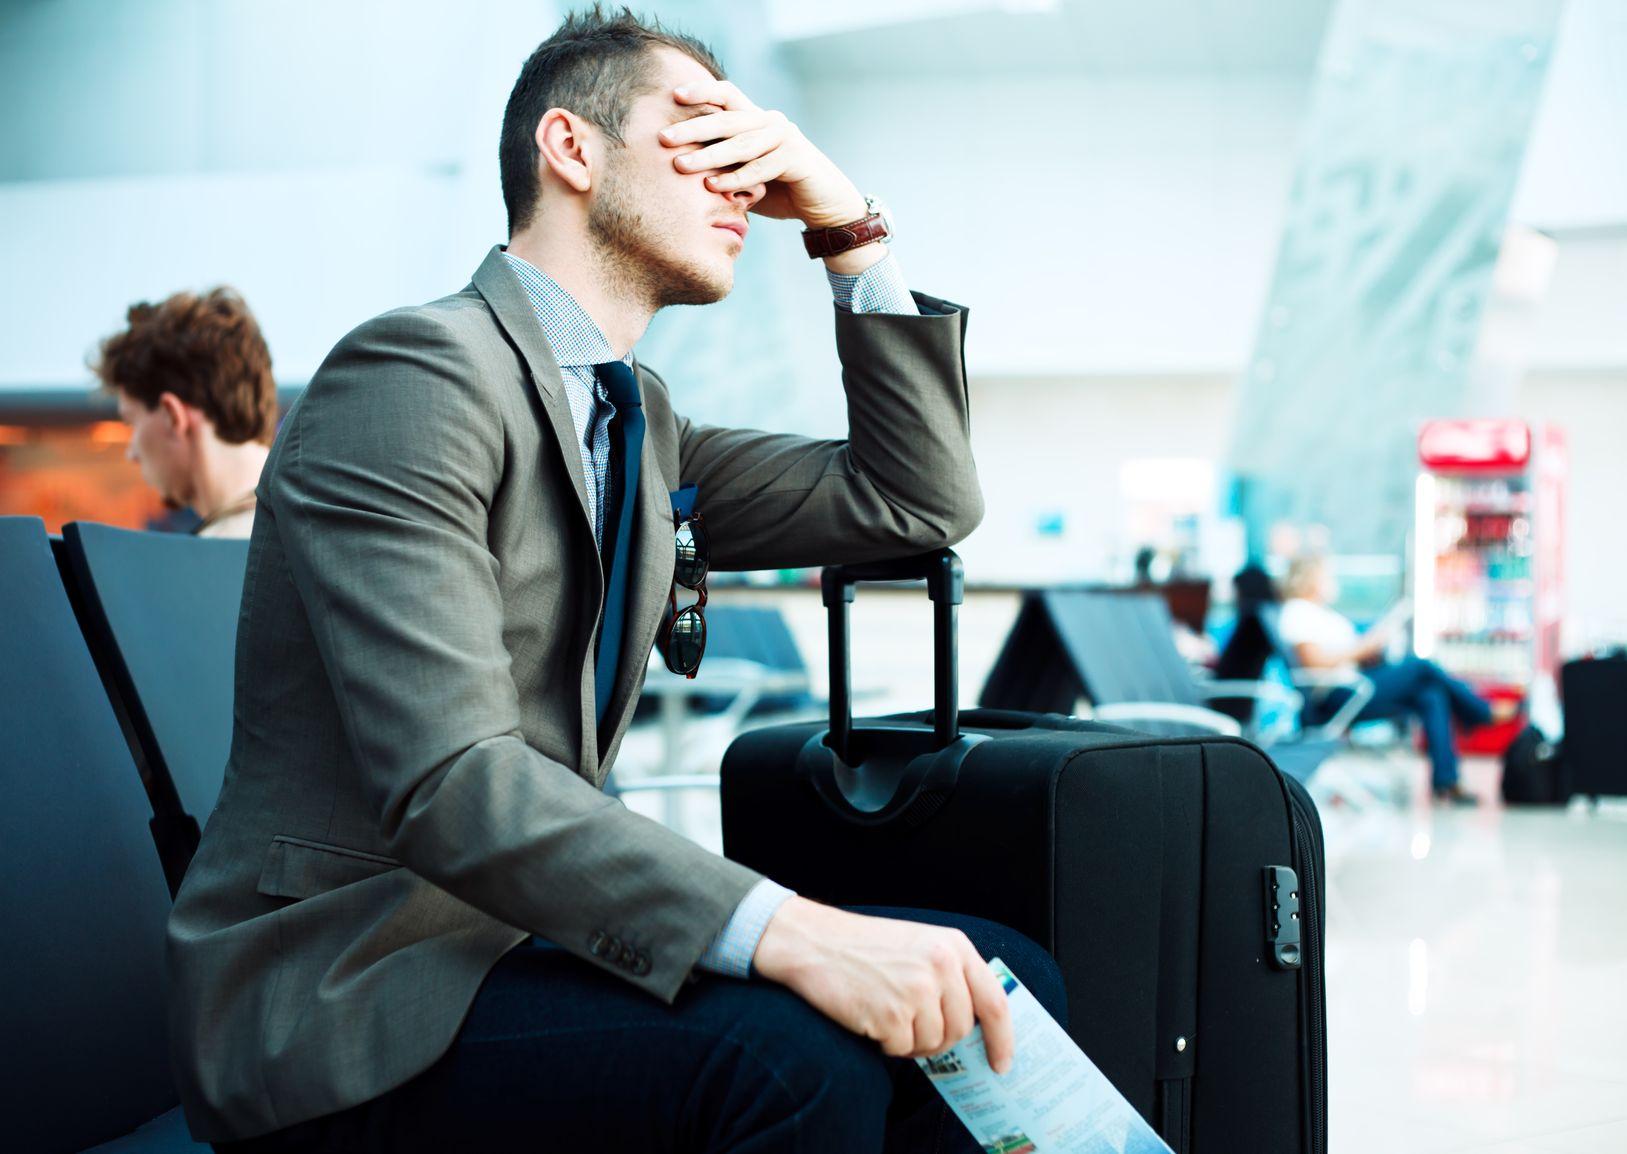 35066477 - delayed flight